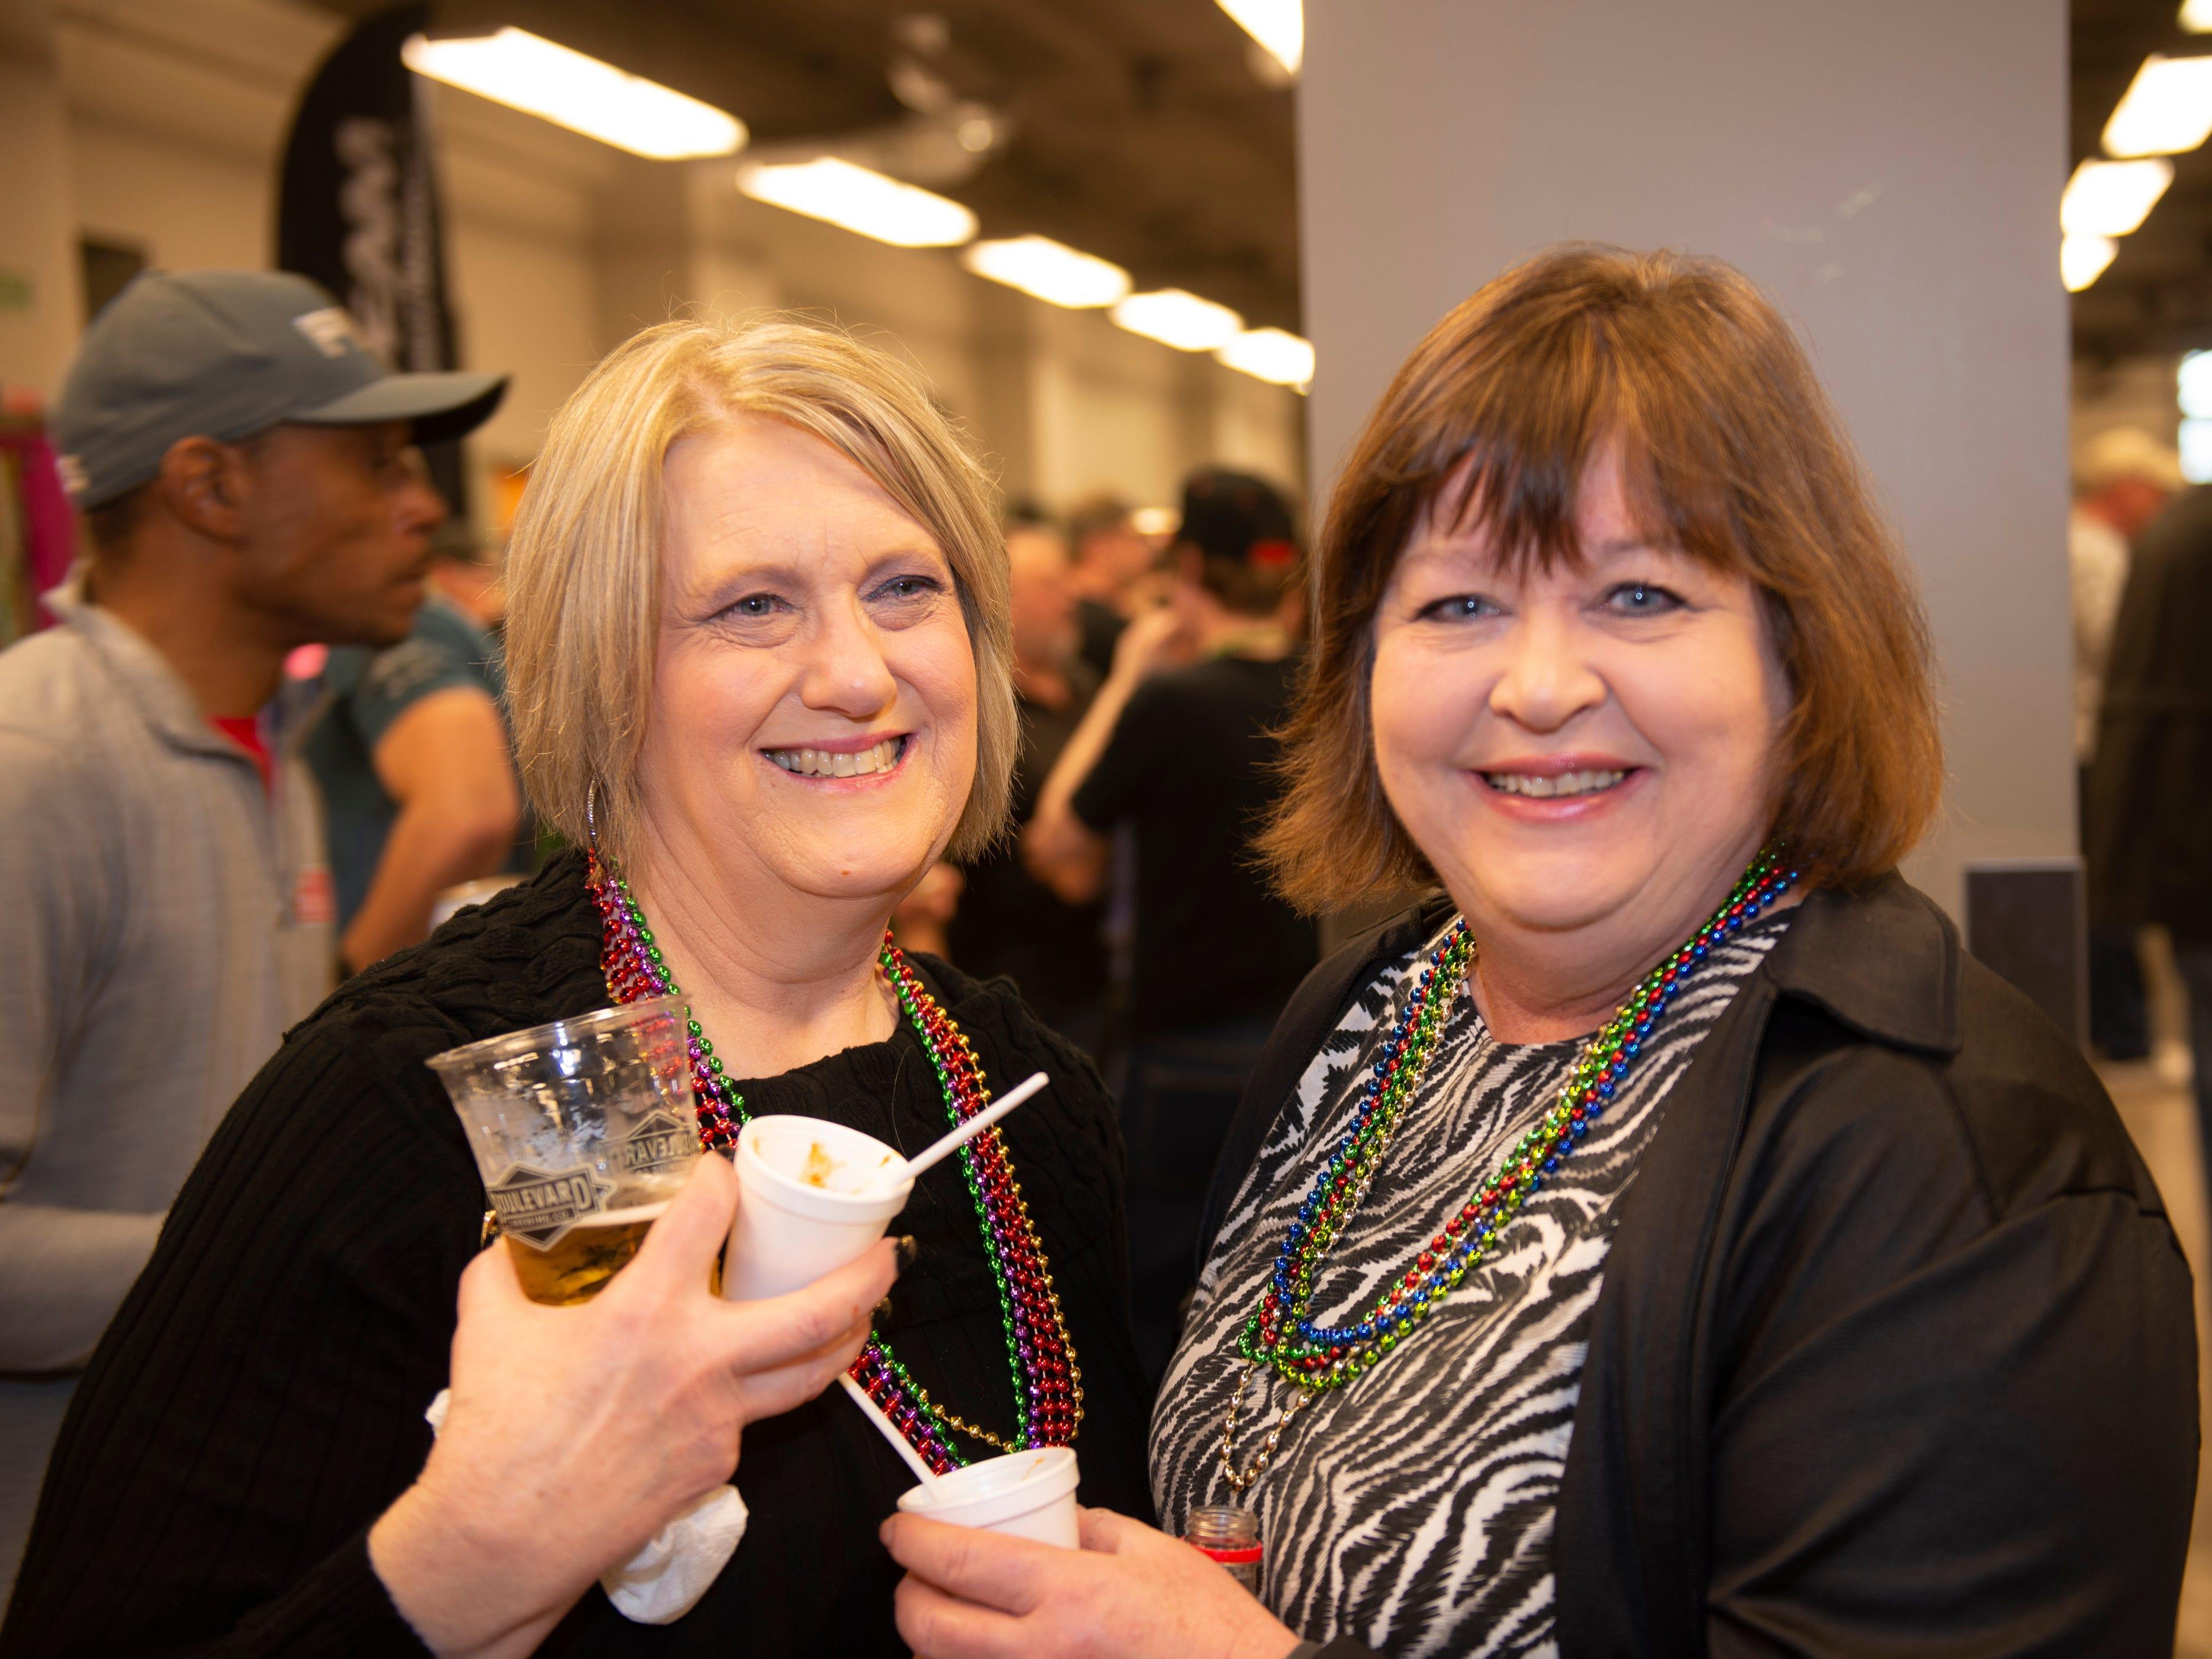 Beth Colwell and Karen Casada